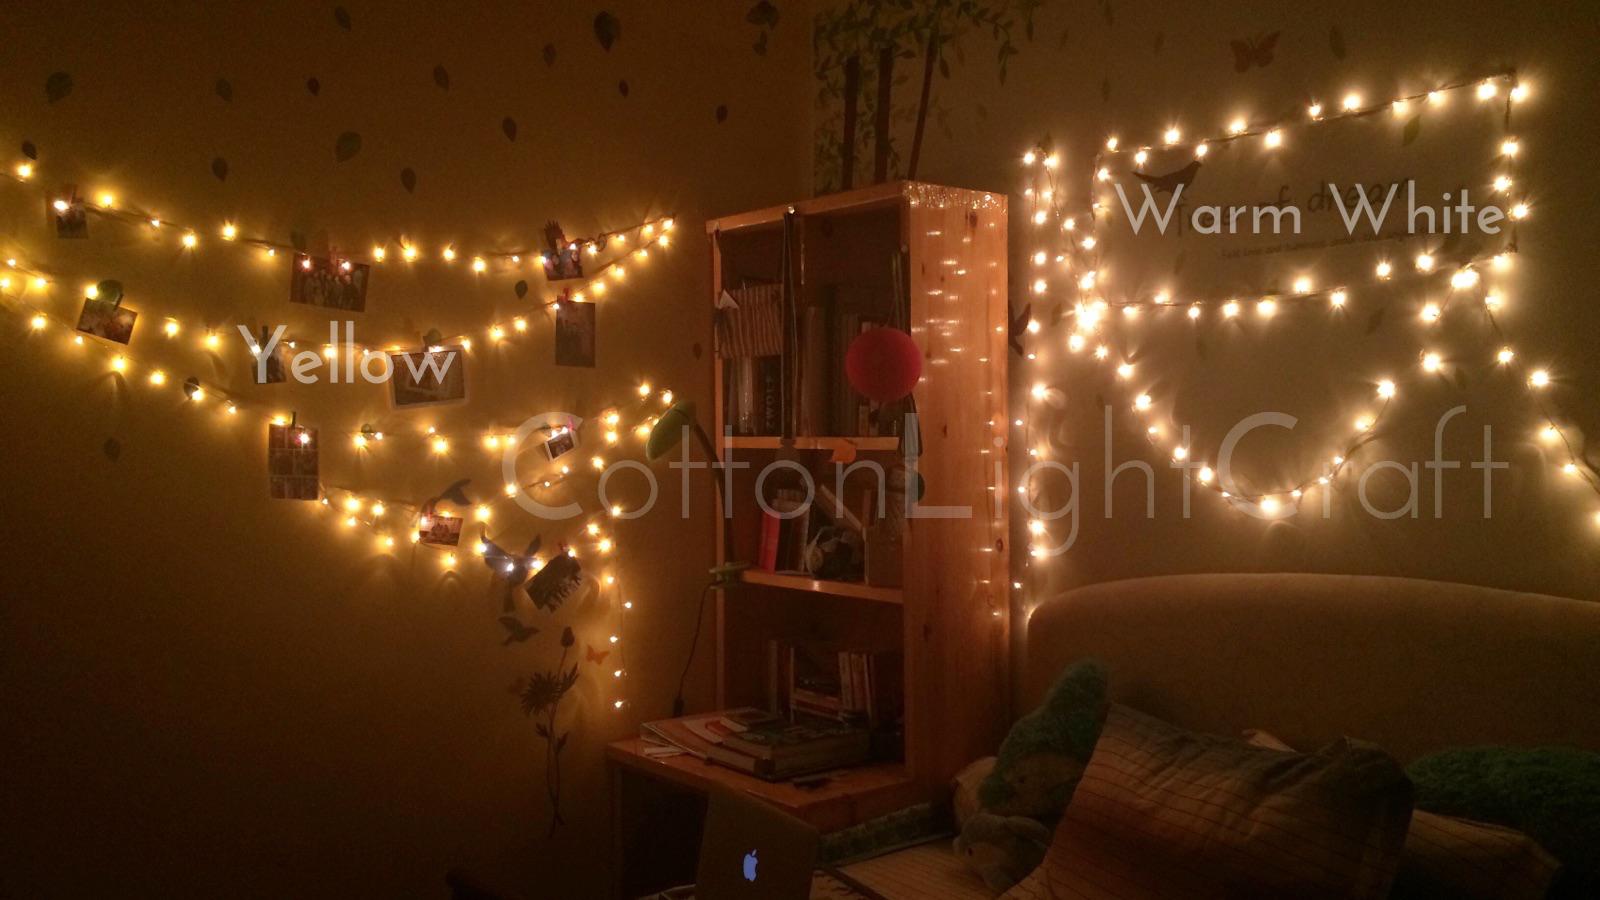 Led Lamp Tumblr Rice Lampu Yellow Daftar Update Natal Hias Warm White Mylight Id Shop Line Source Jual Starry Light